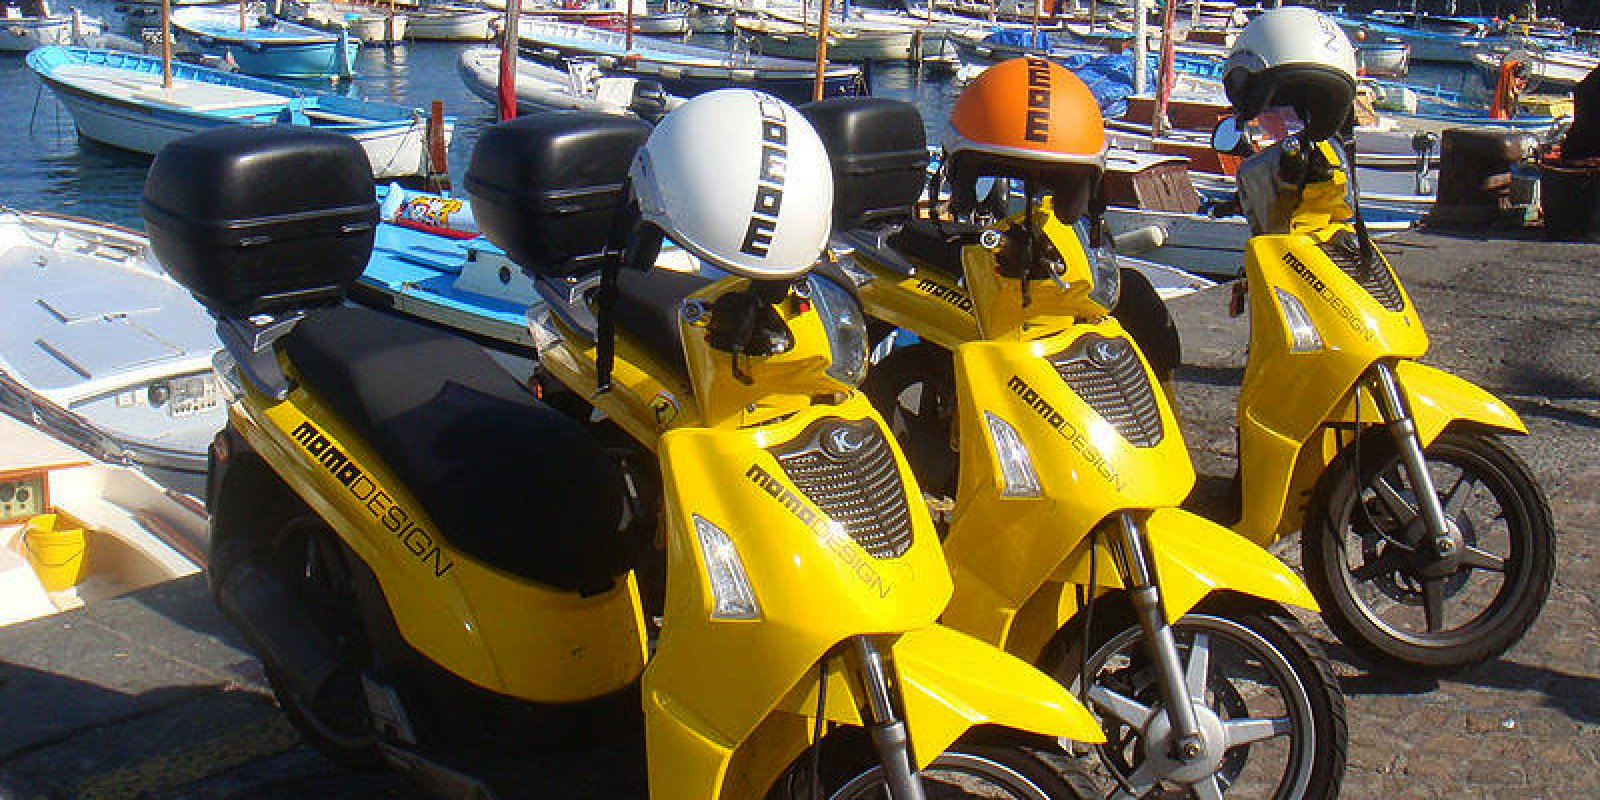 Oasi motor scooter and boat rental in capri partners for Blue sea motor inn